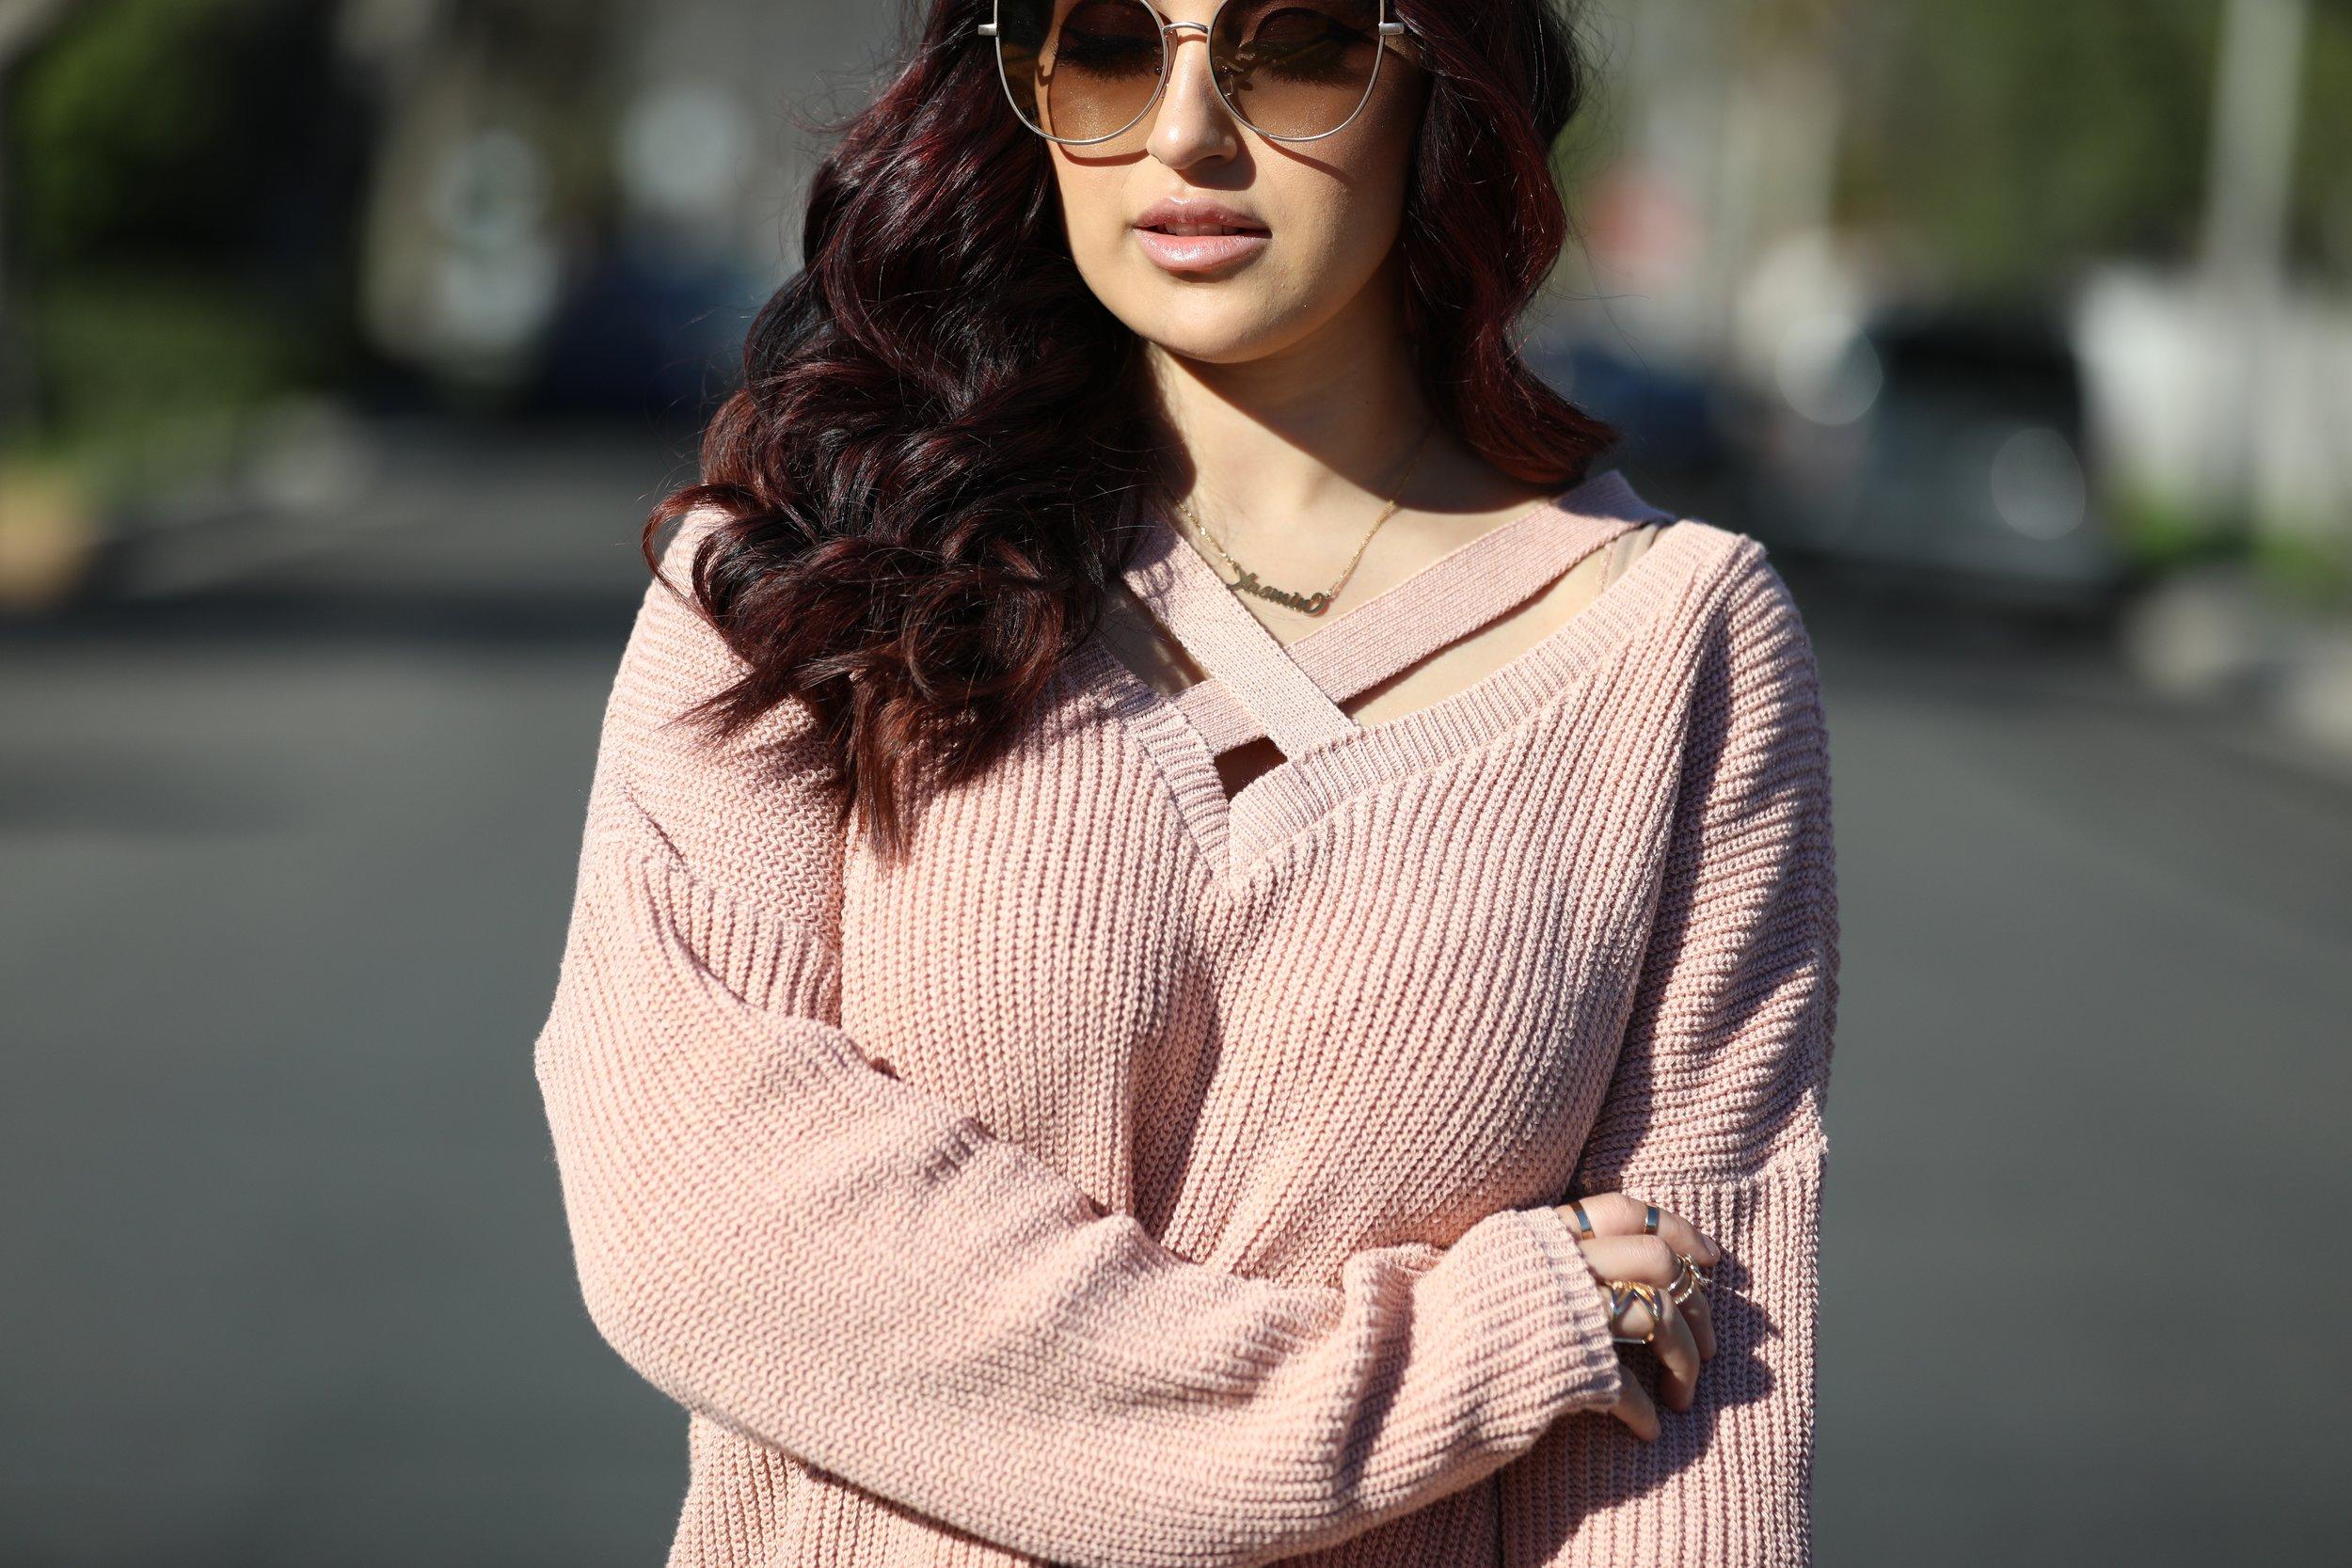 Knit Sweater (similar):  B  ohoo